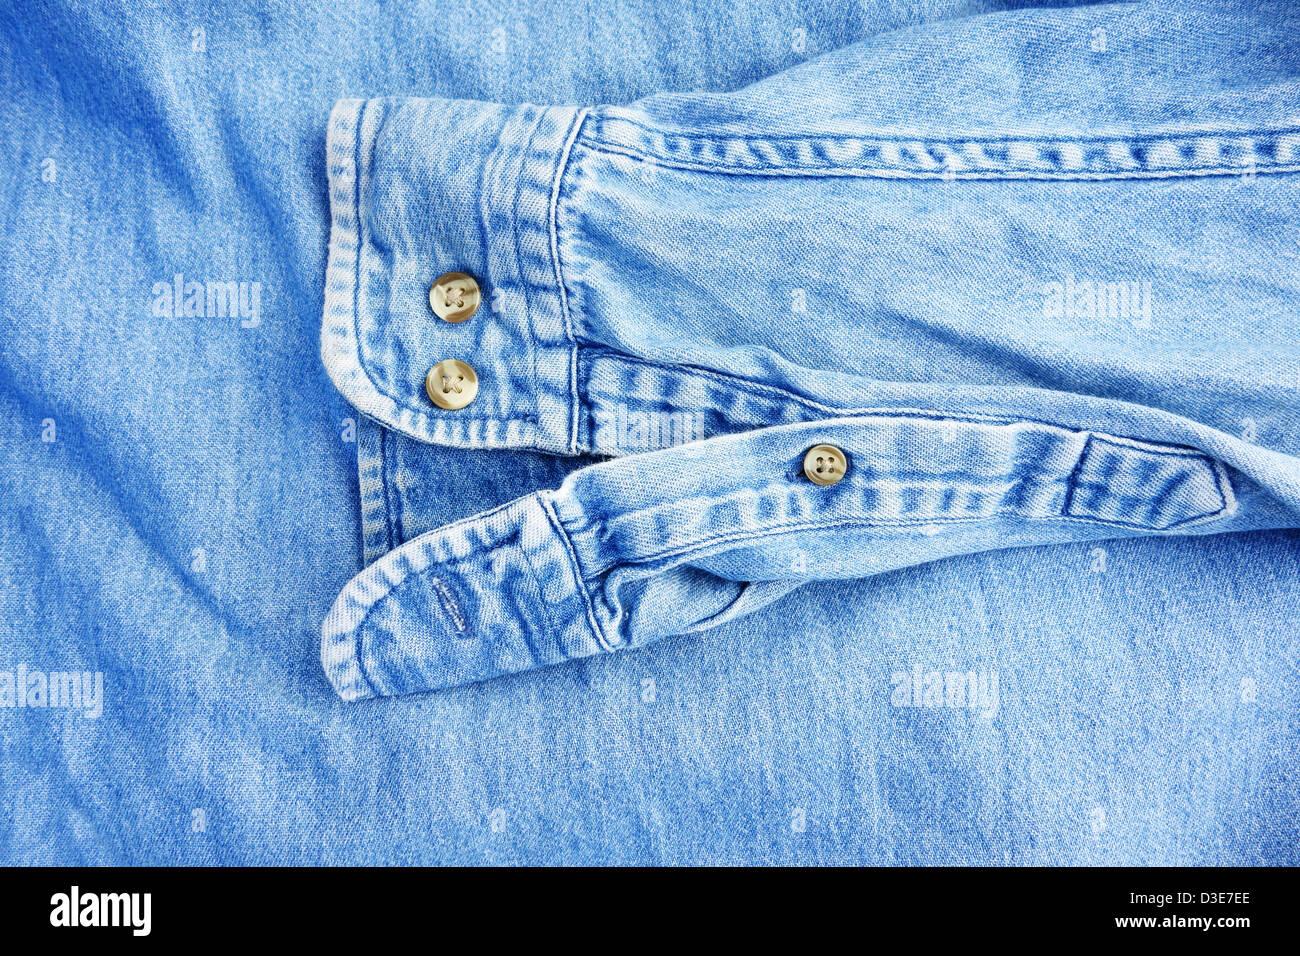 Denim shirt sleeve on top of denim material - Stock Image